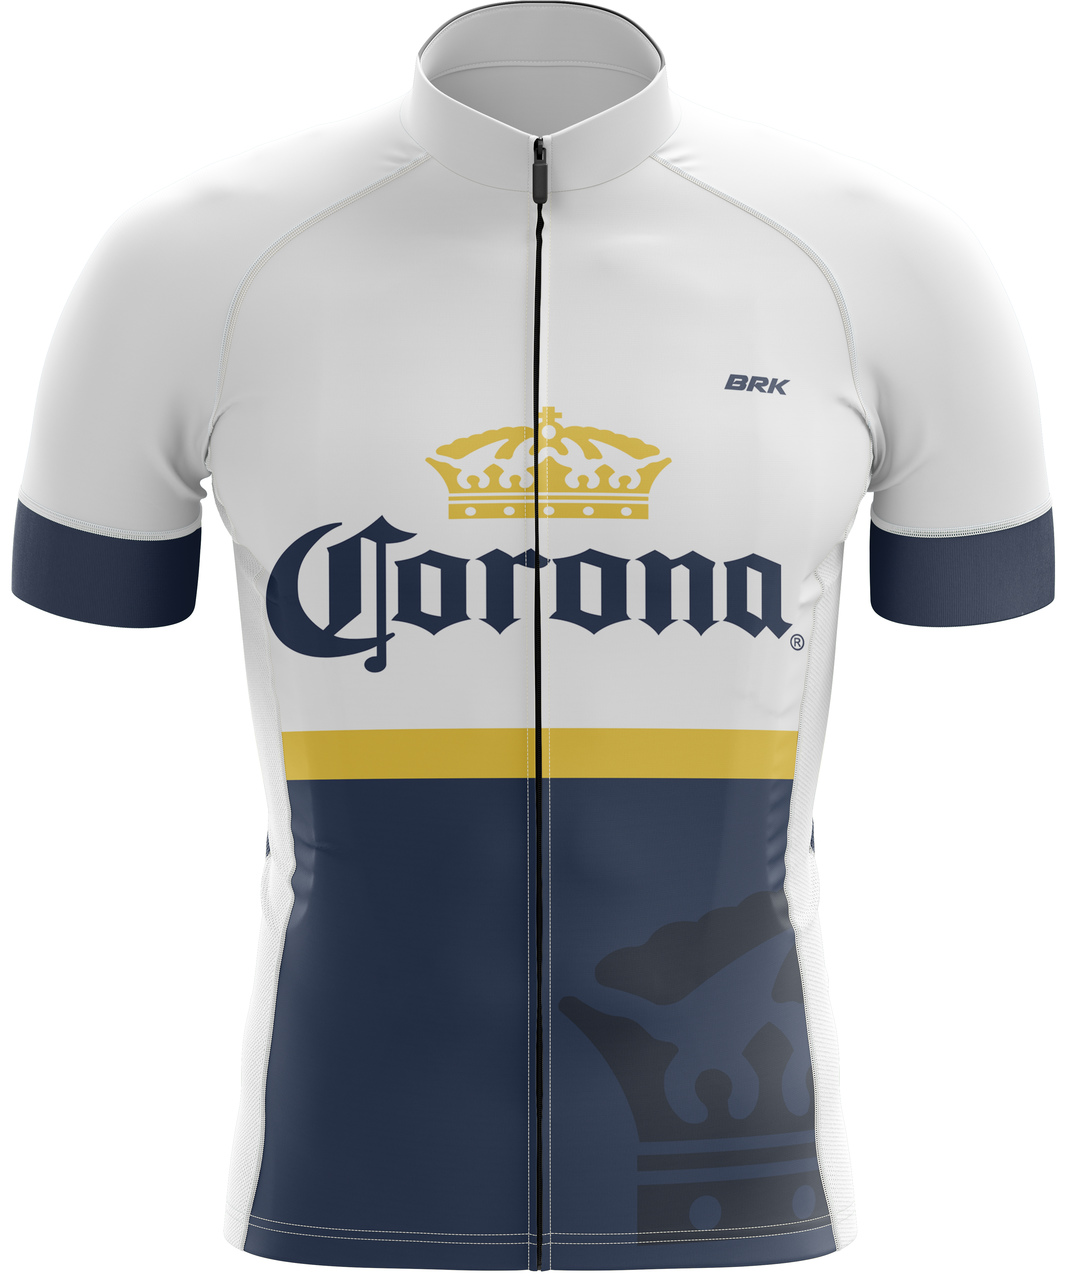 Camisa Ciclismo Brk Cerveja Corona com FPU 50+